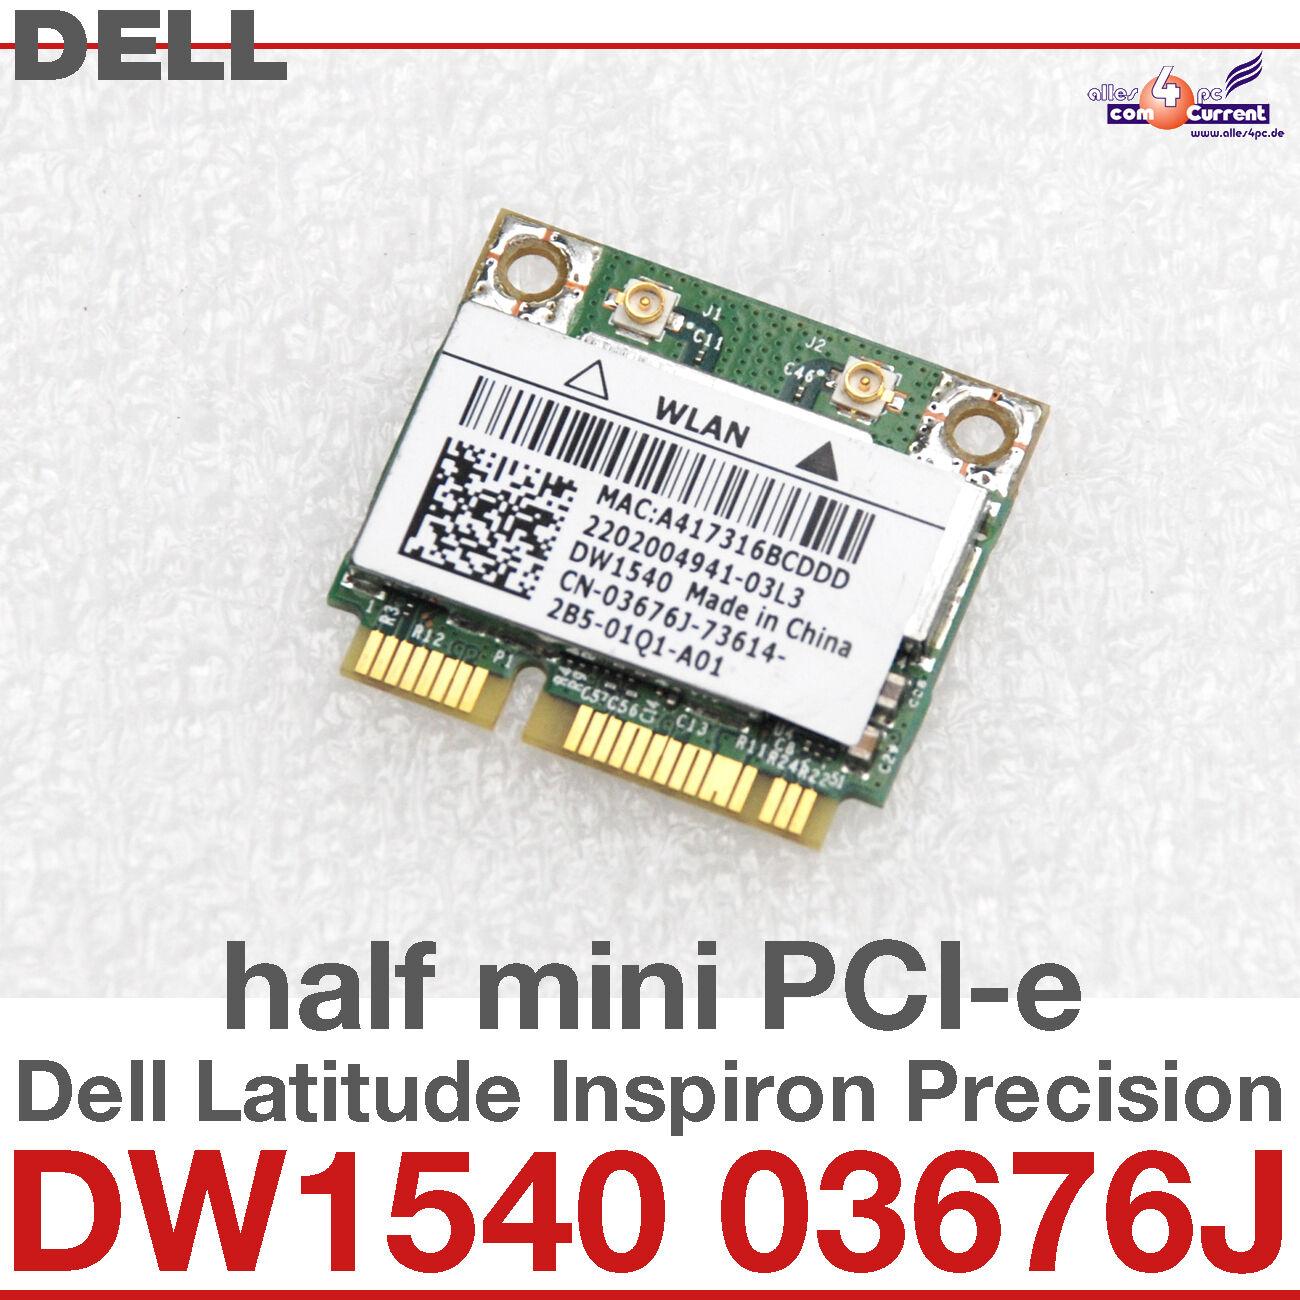 wi-Fi WLAN Wireless Card Network Card For Dell Mini Pci-E DW1540 03676J #D20